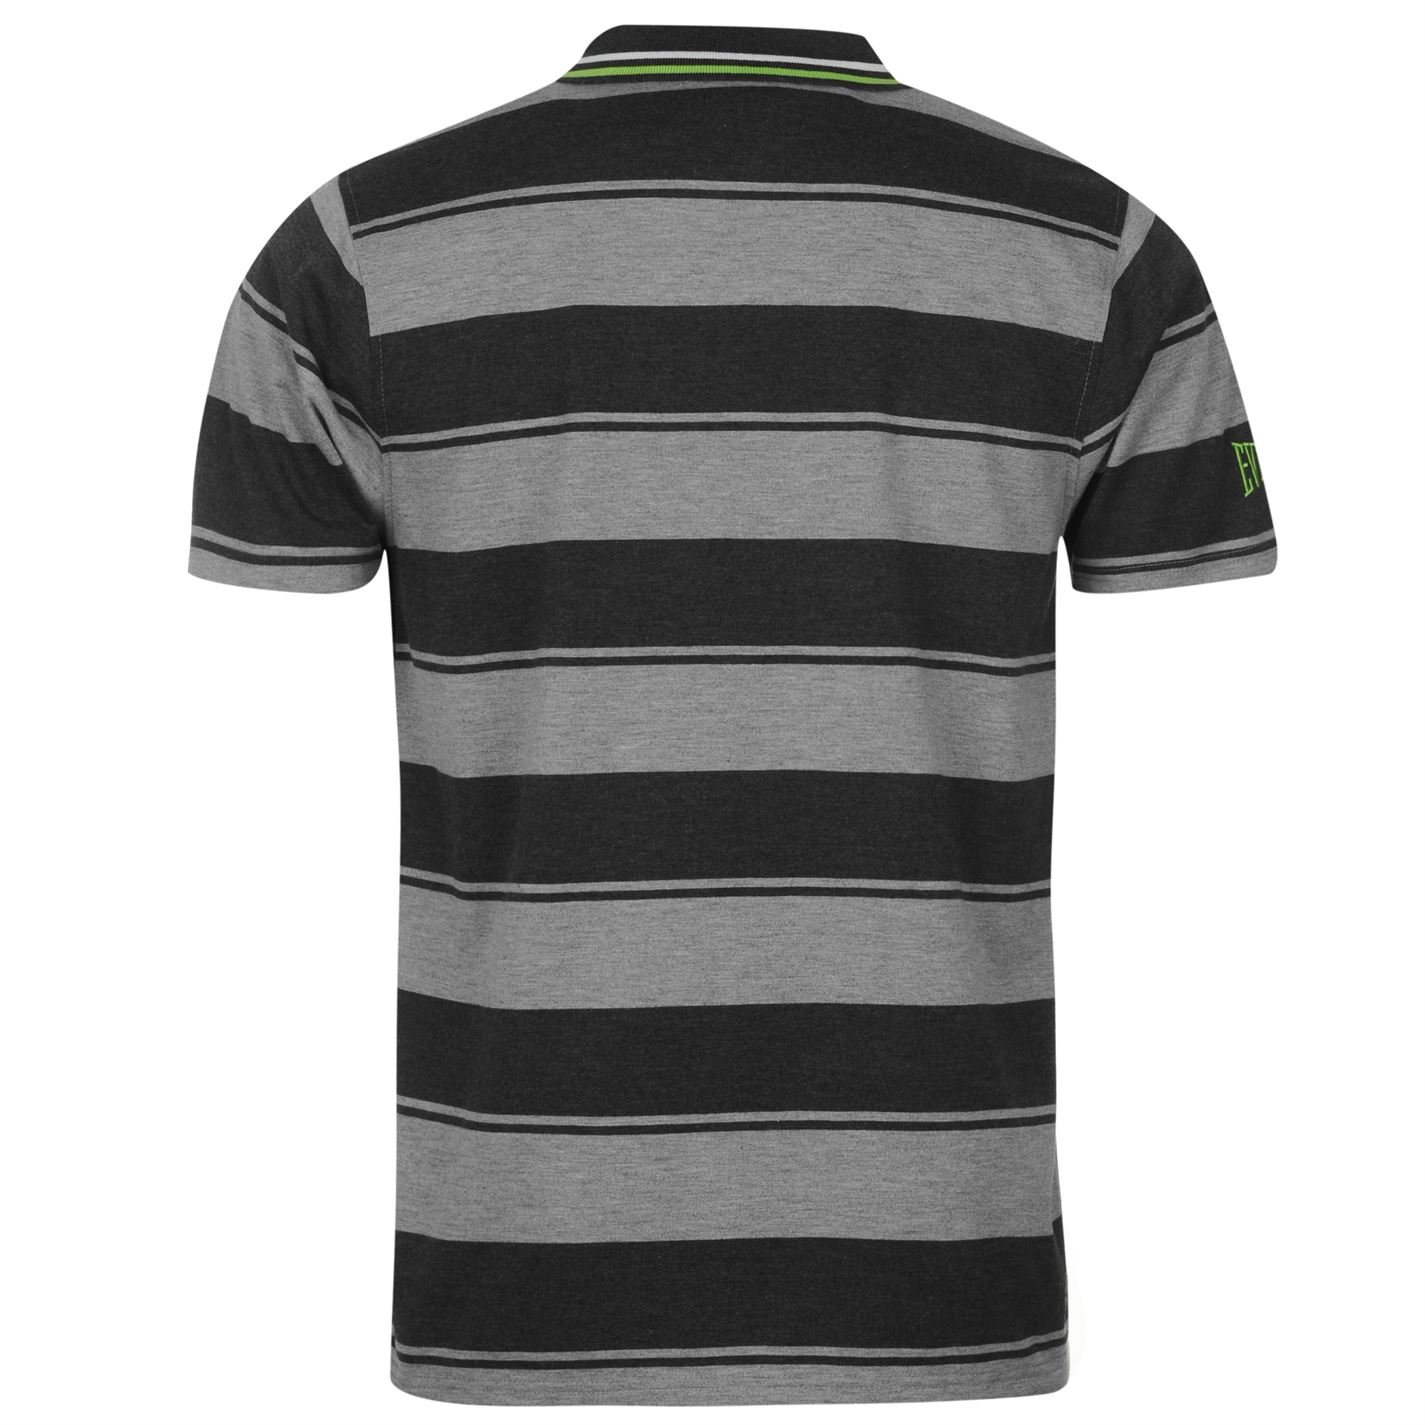 Everlast Mens Yarn Dye Bold Stripe Polo Short Sleeve Sports Casual Tee Clothing